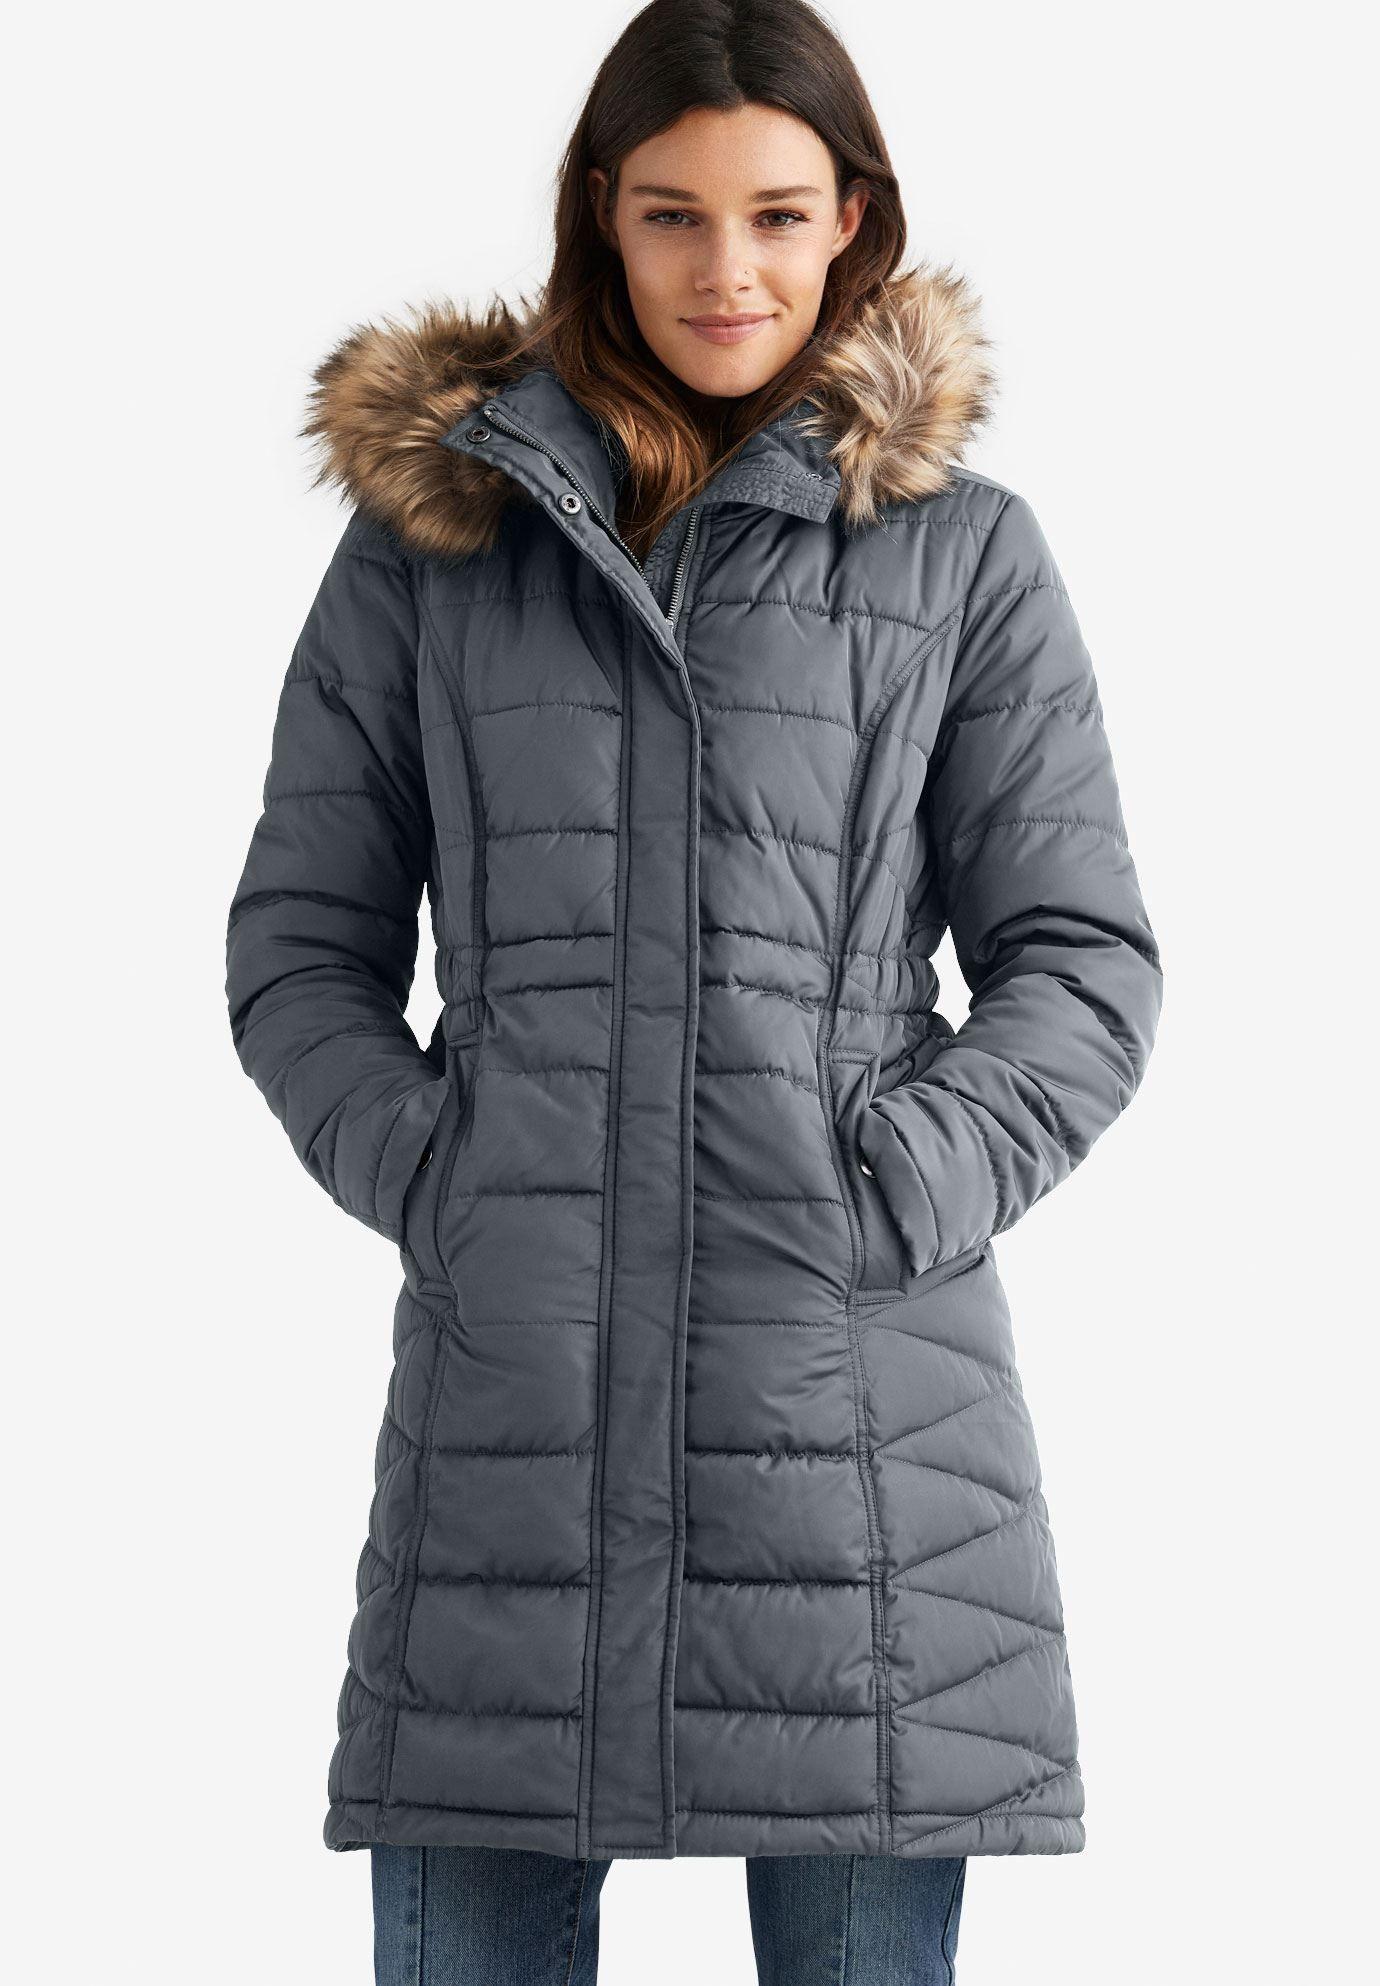 Faux Fur Trim Puffer Puffer Jacket Women Plus Size Puffer Coat Winter Puffer Coat [ 1986 x 1380 Pixel ]